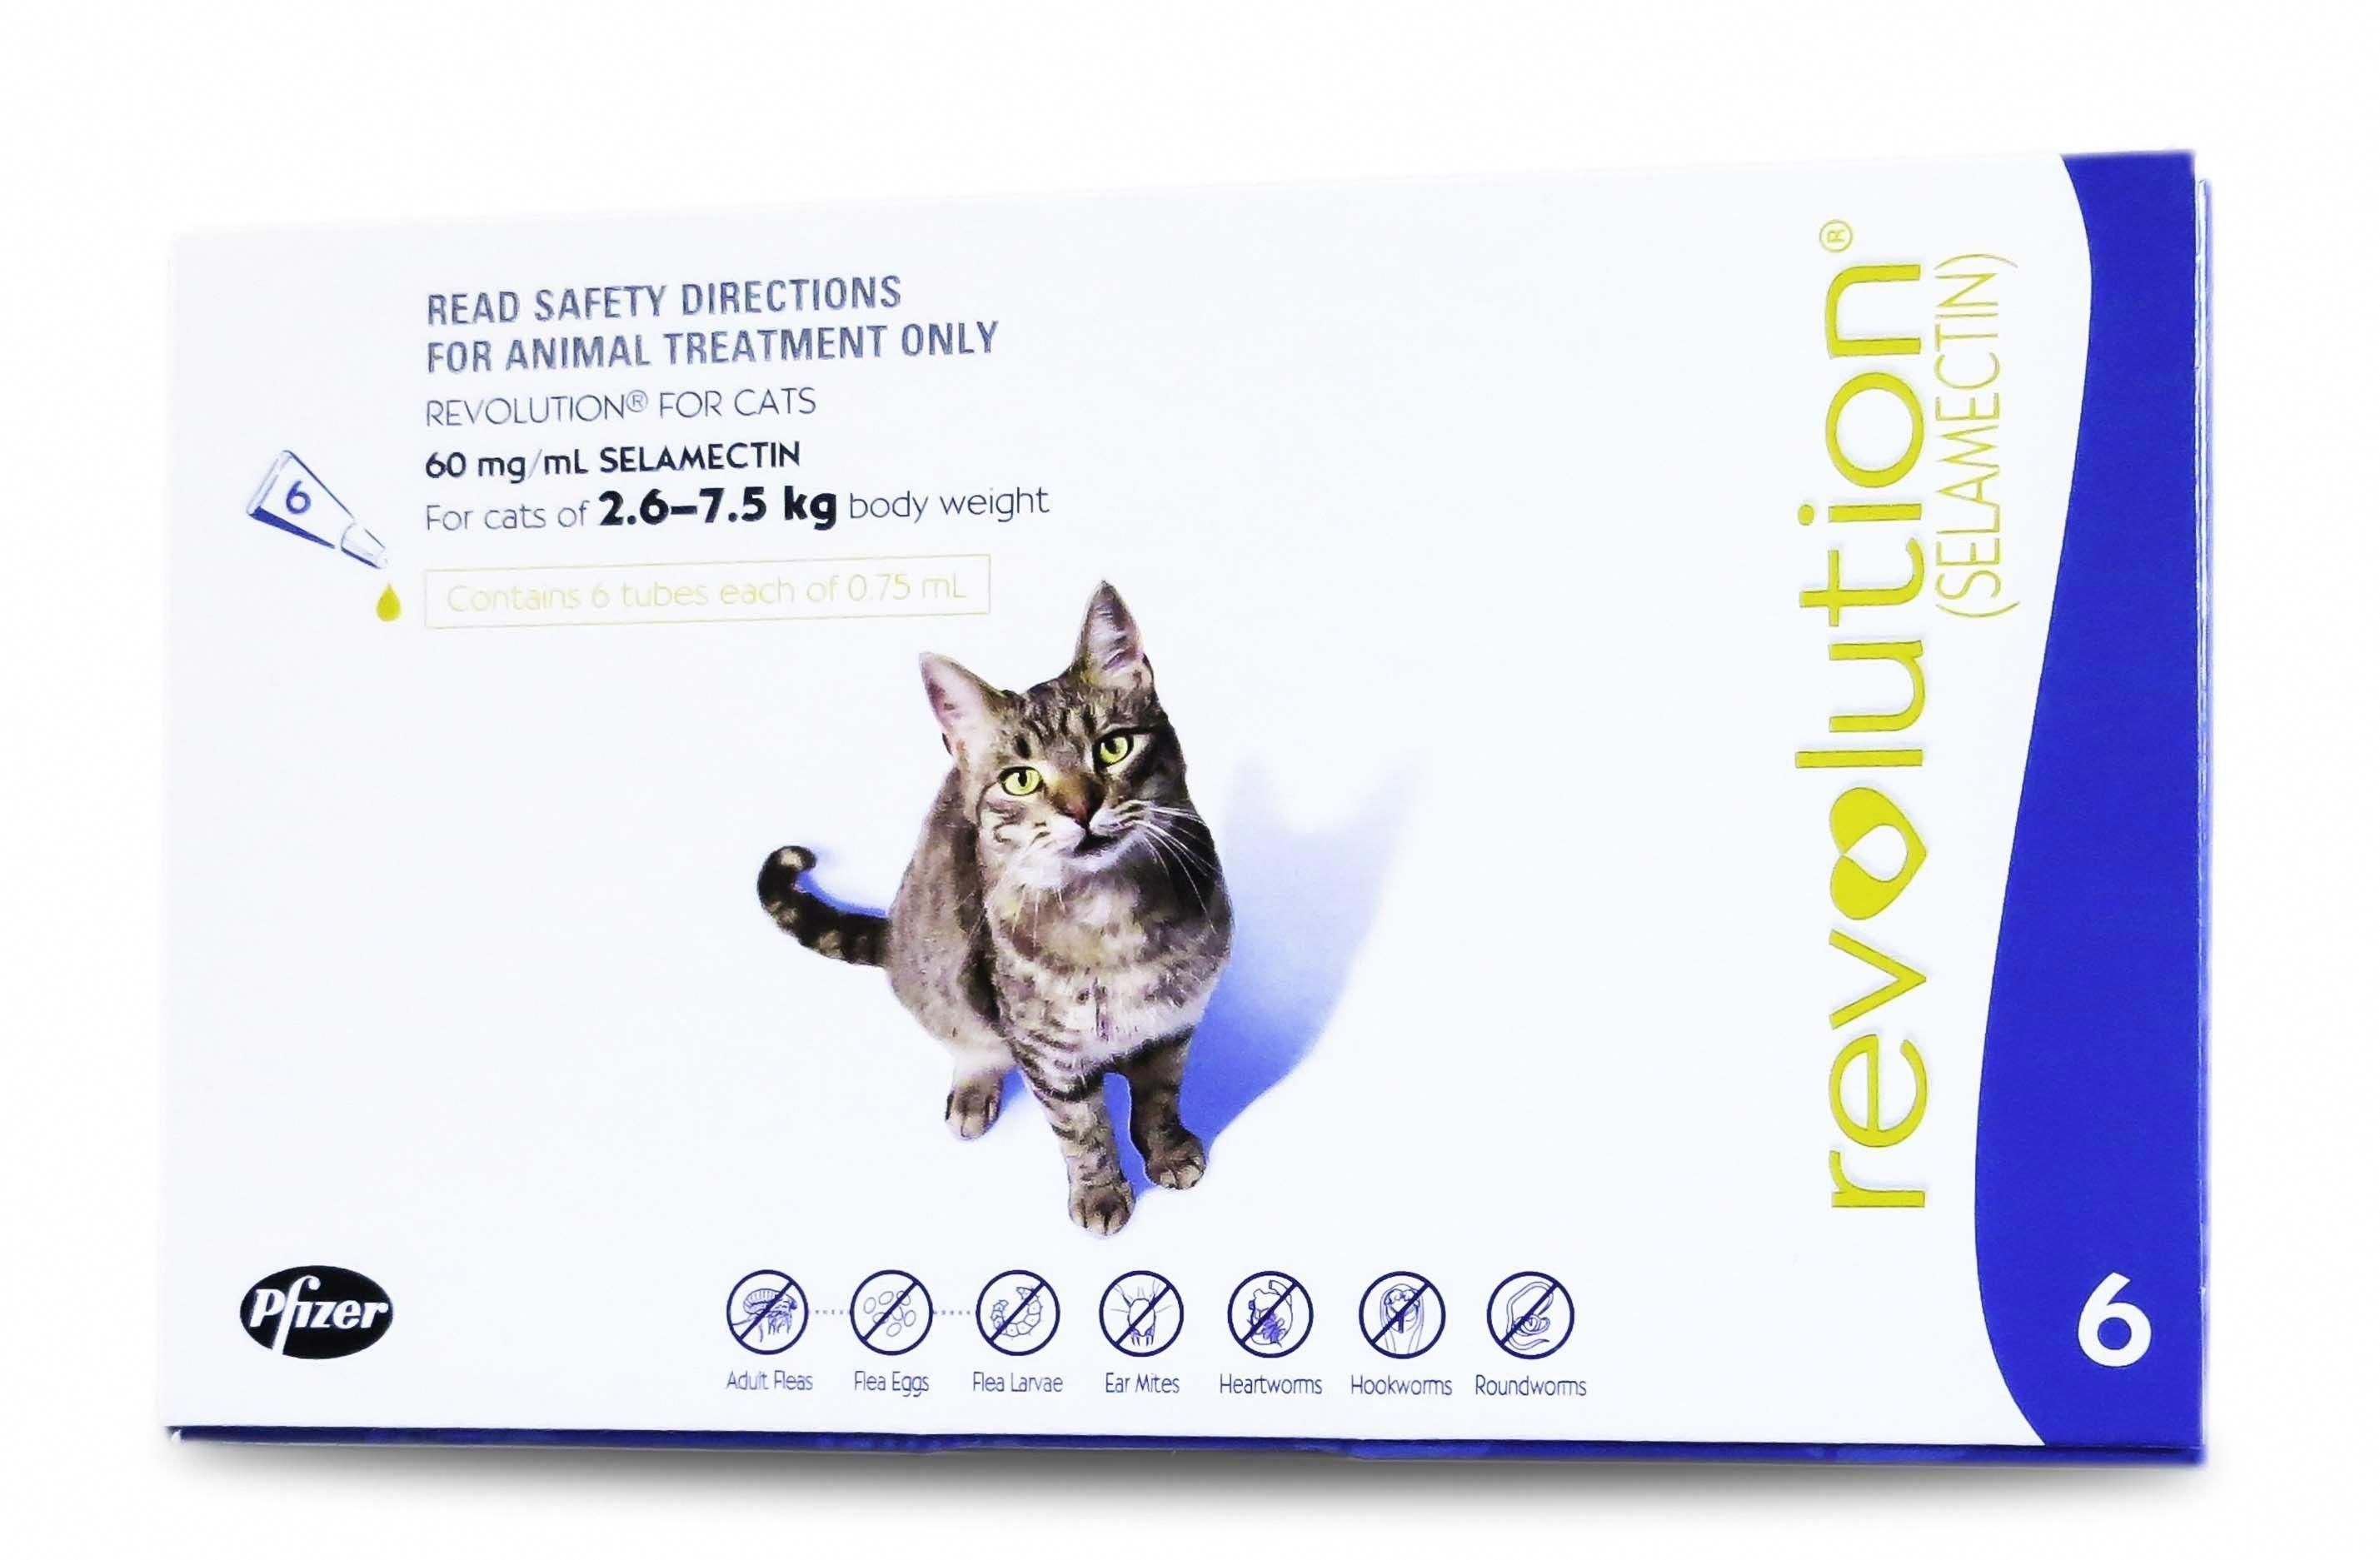 Cats Fighting Post1450622128 Cats, Cat medication